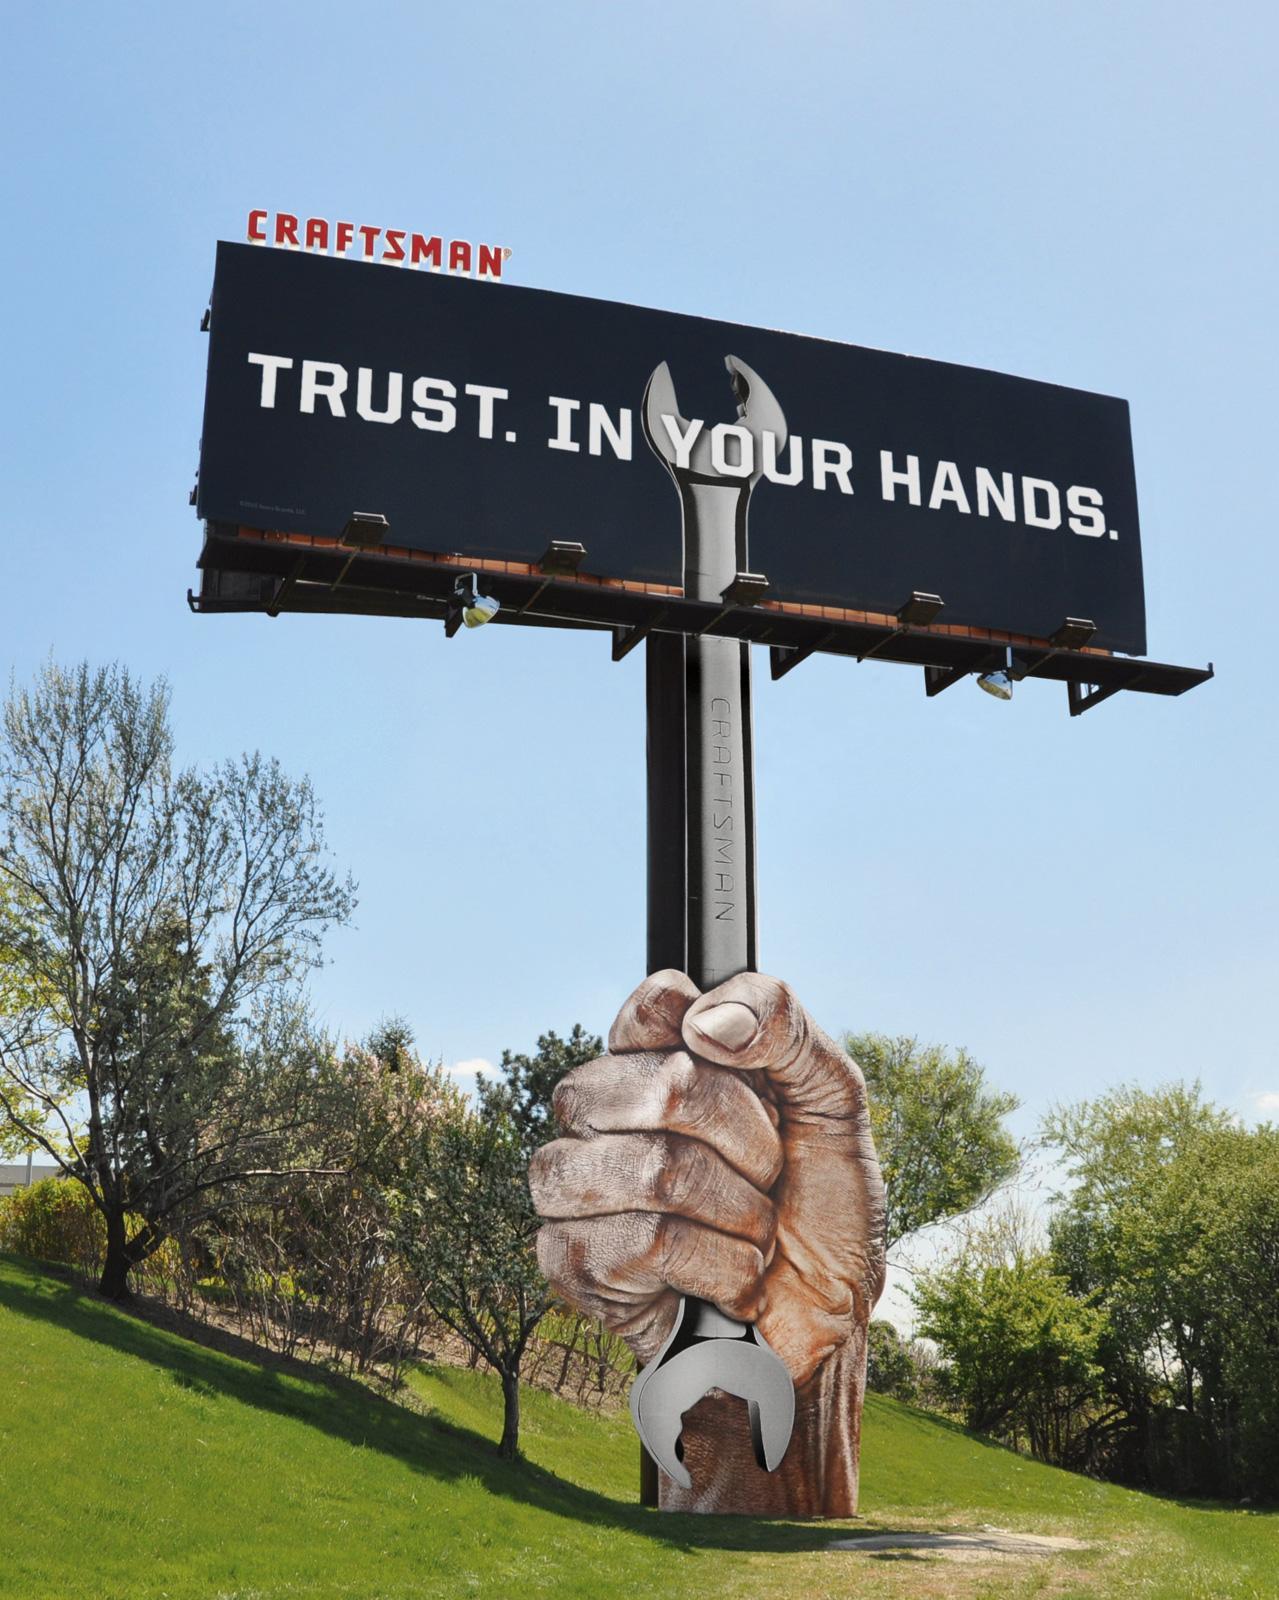 Craftsman Tools Outdoor Ad -  Wrench billboard